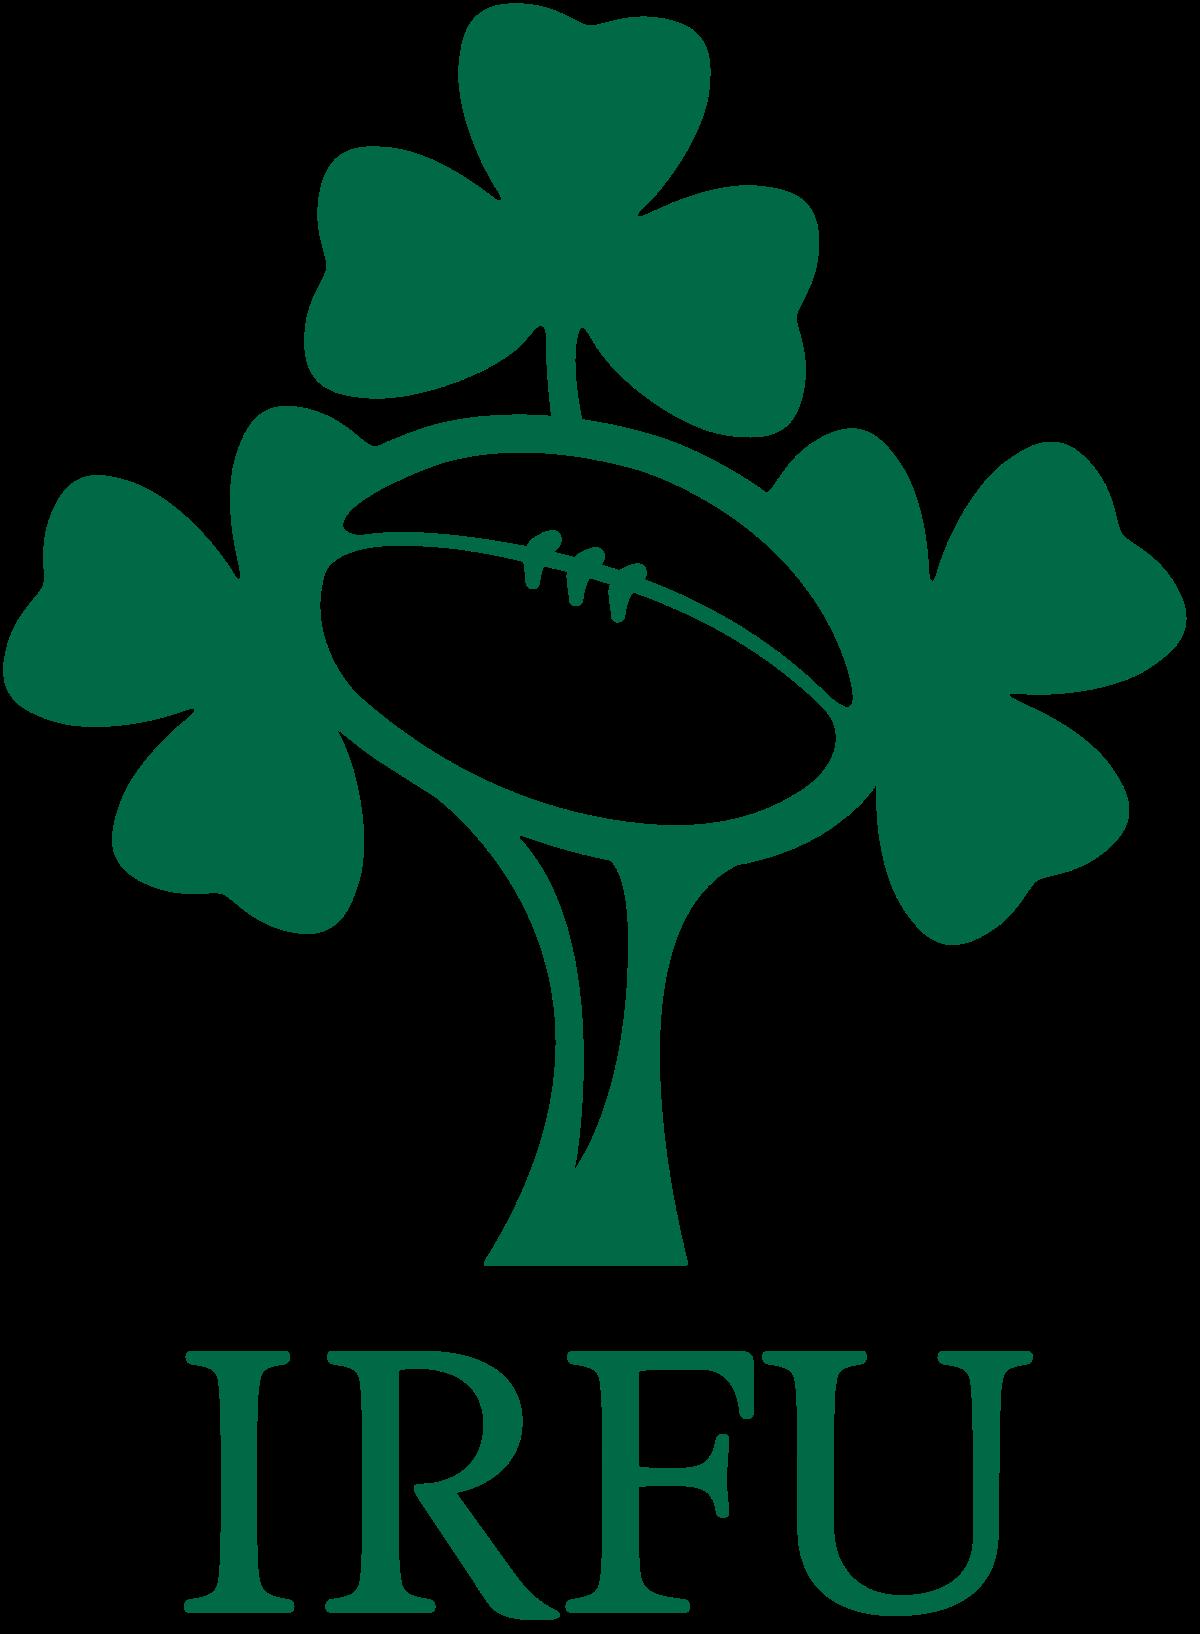 1200x1634 Irish Rugby Football Union